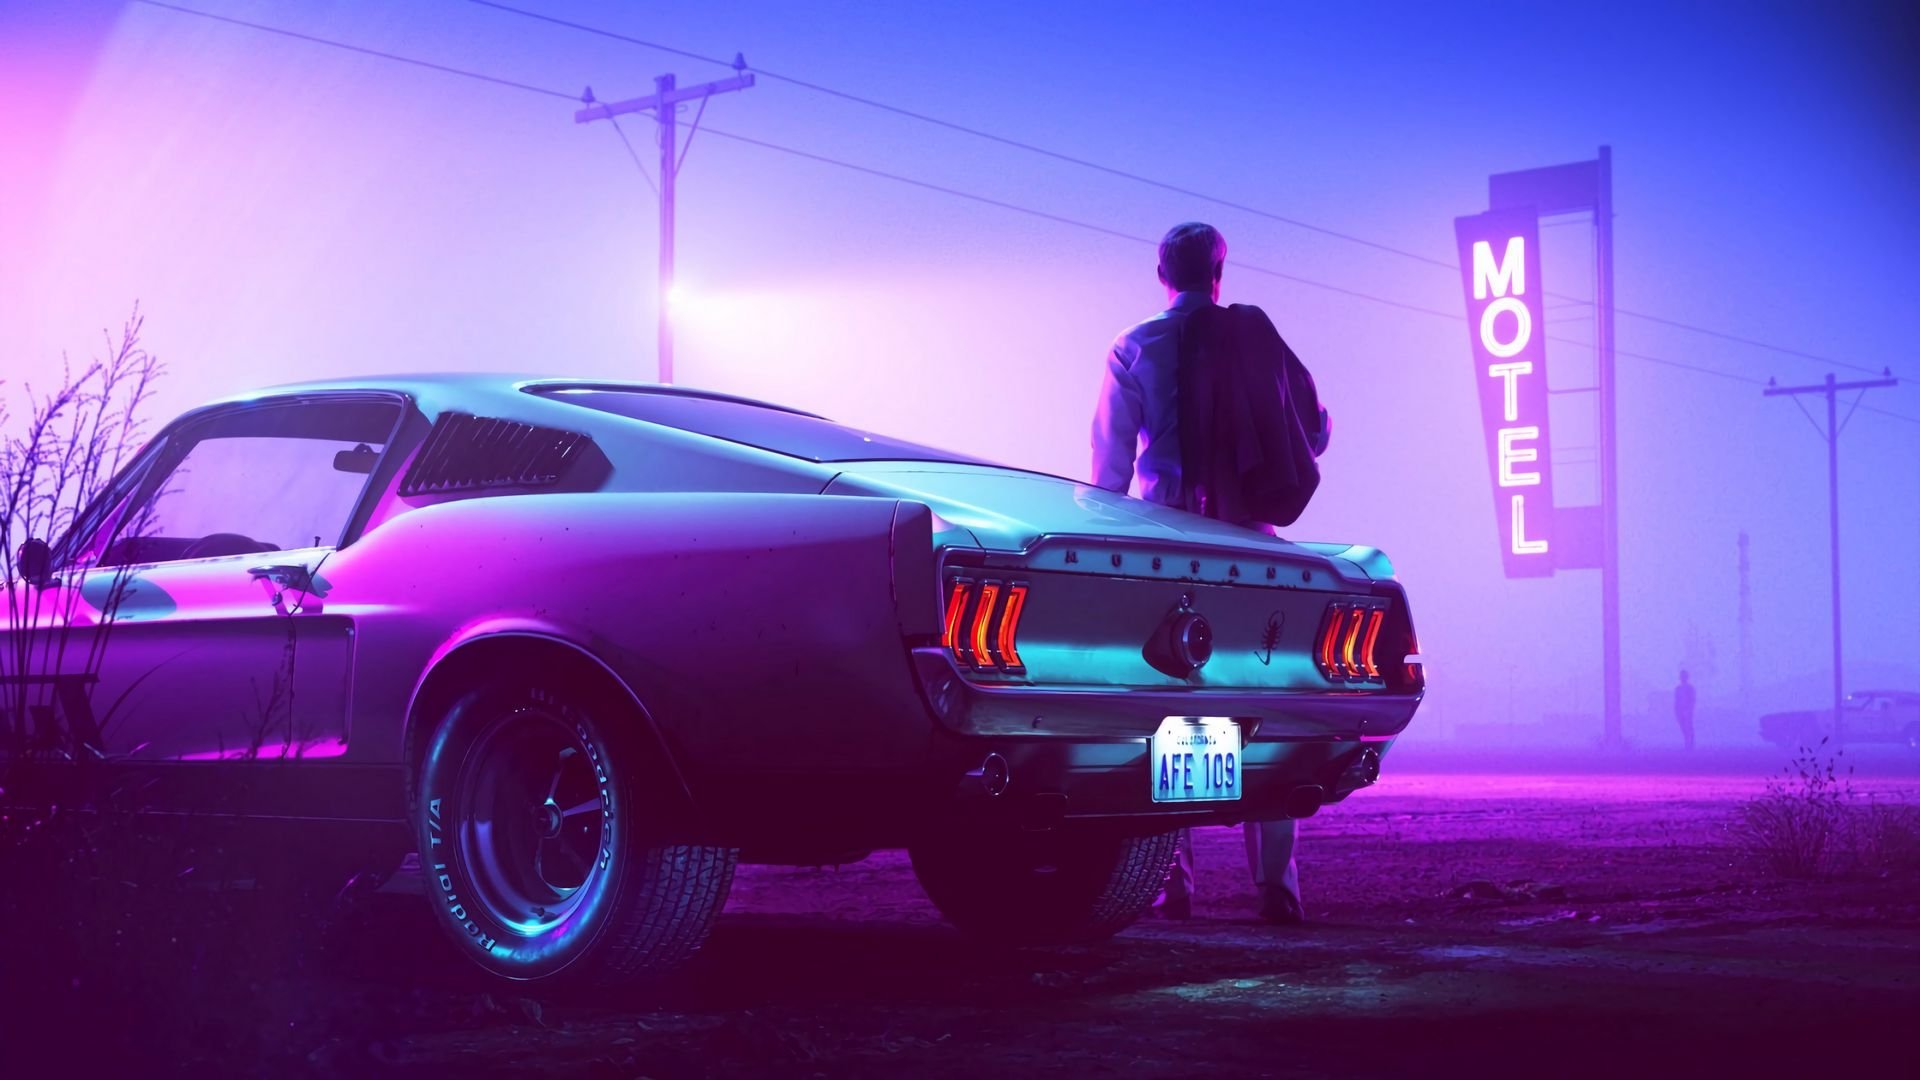 Download wallpaper 1920x1080 car, neon, man, sign full hd ...